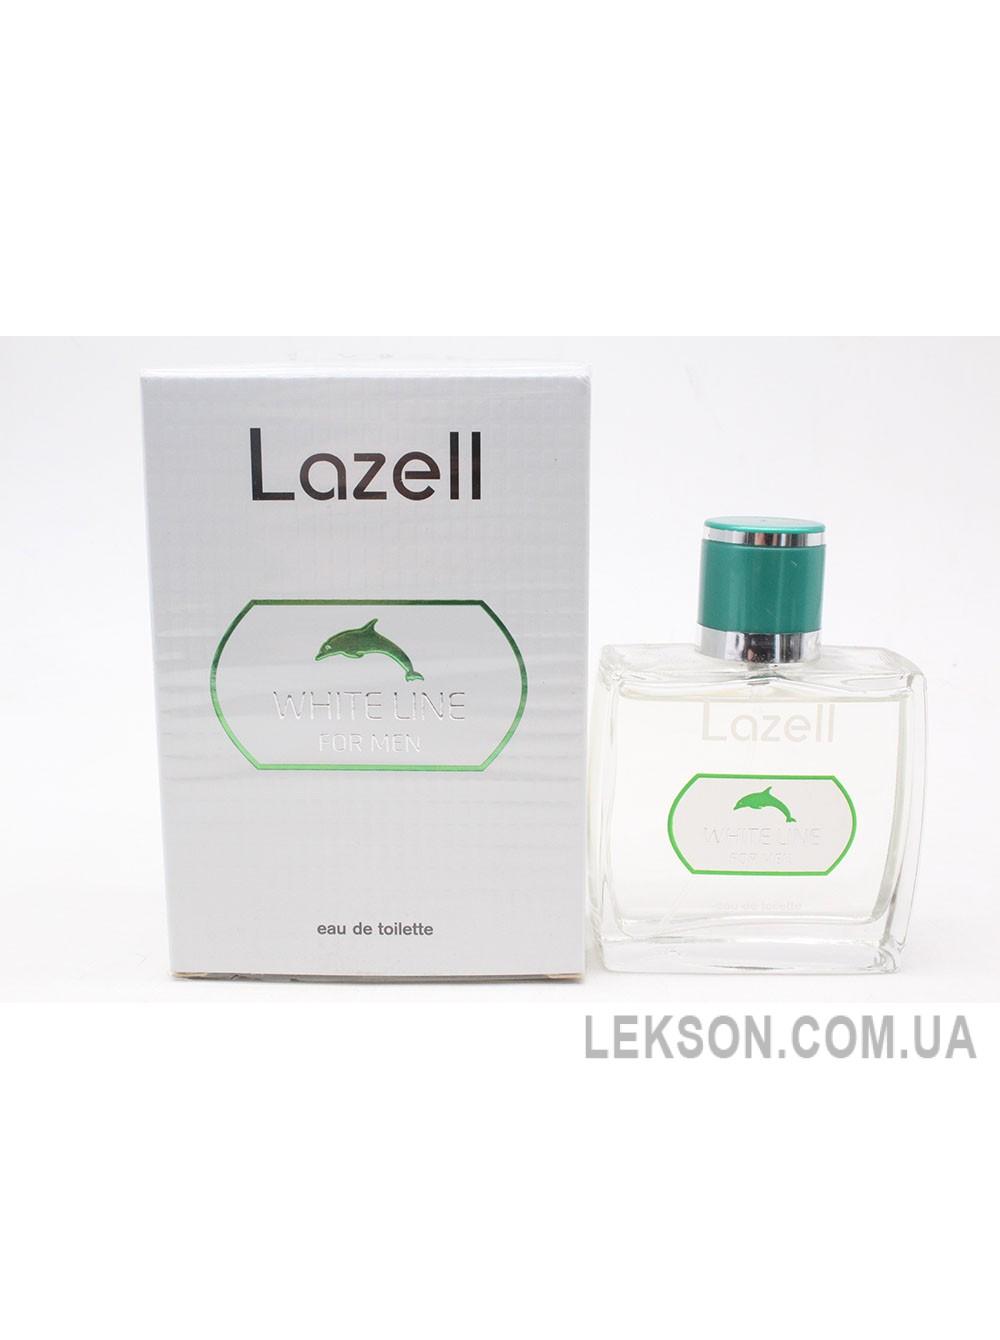 Мужской парфюм тестер: La-107-110 100мл